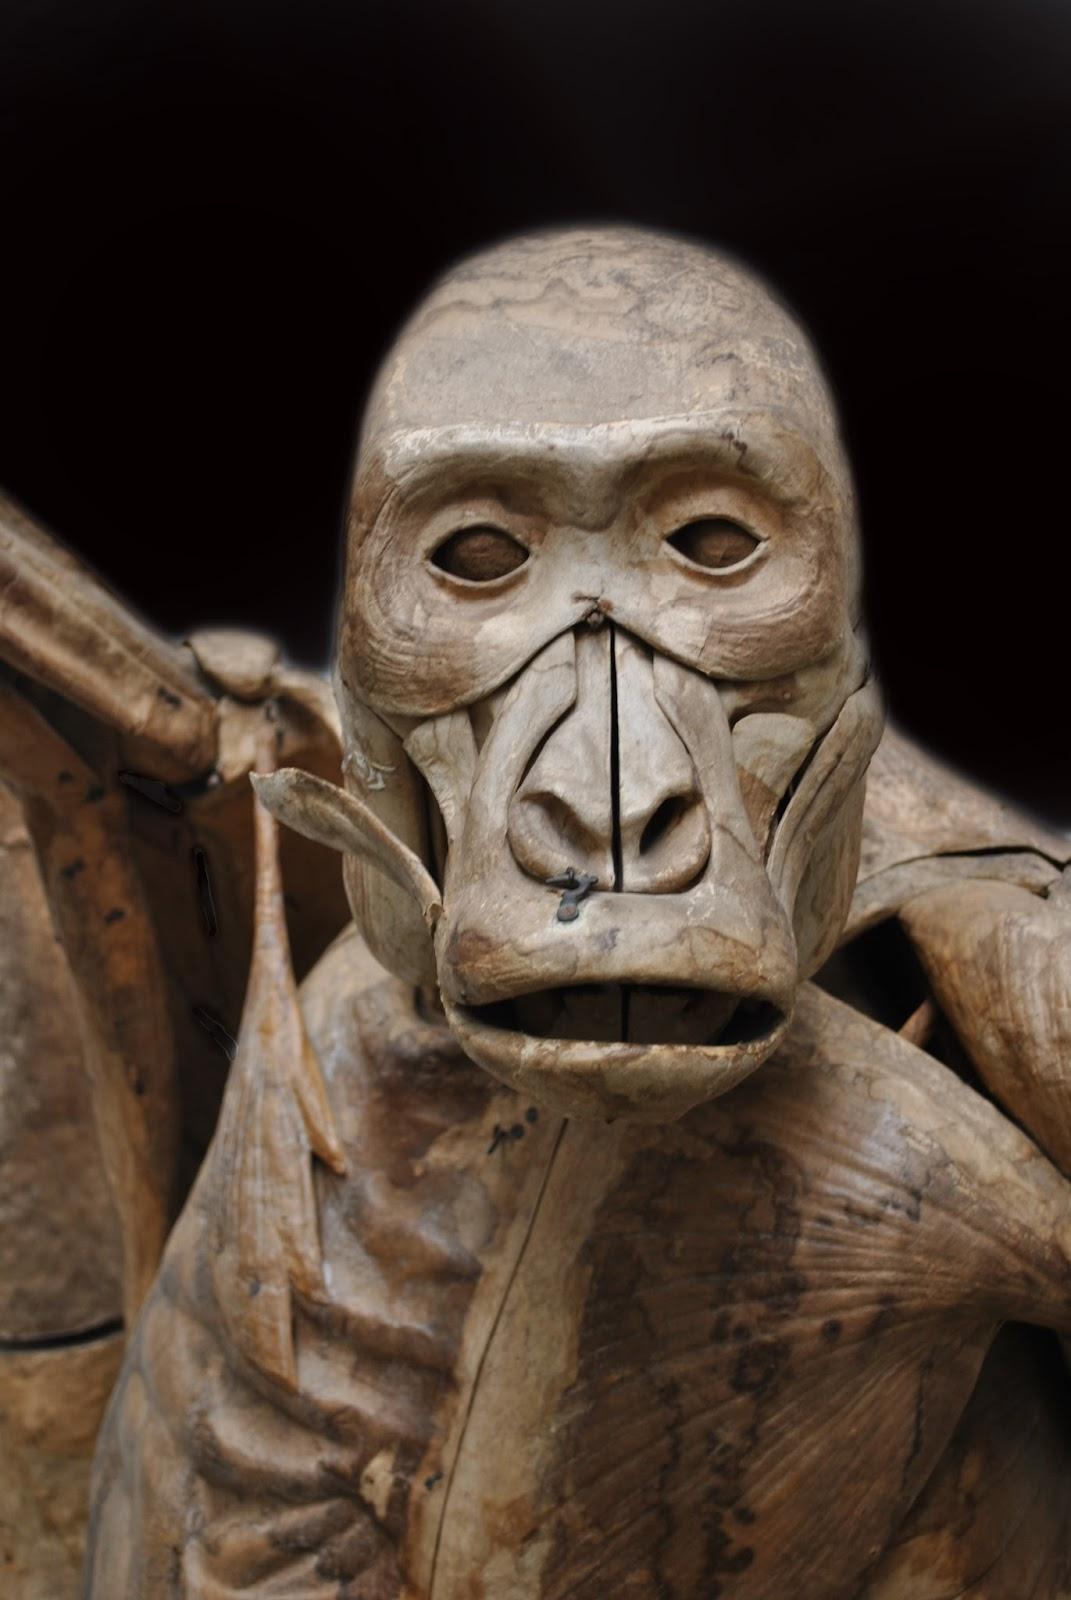 dextrangis: el gorila de auzoux